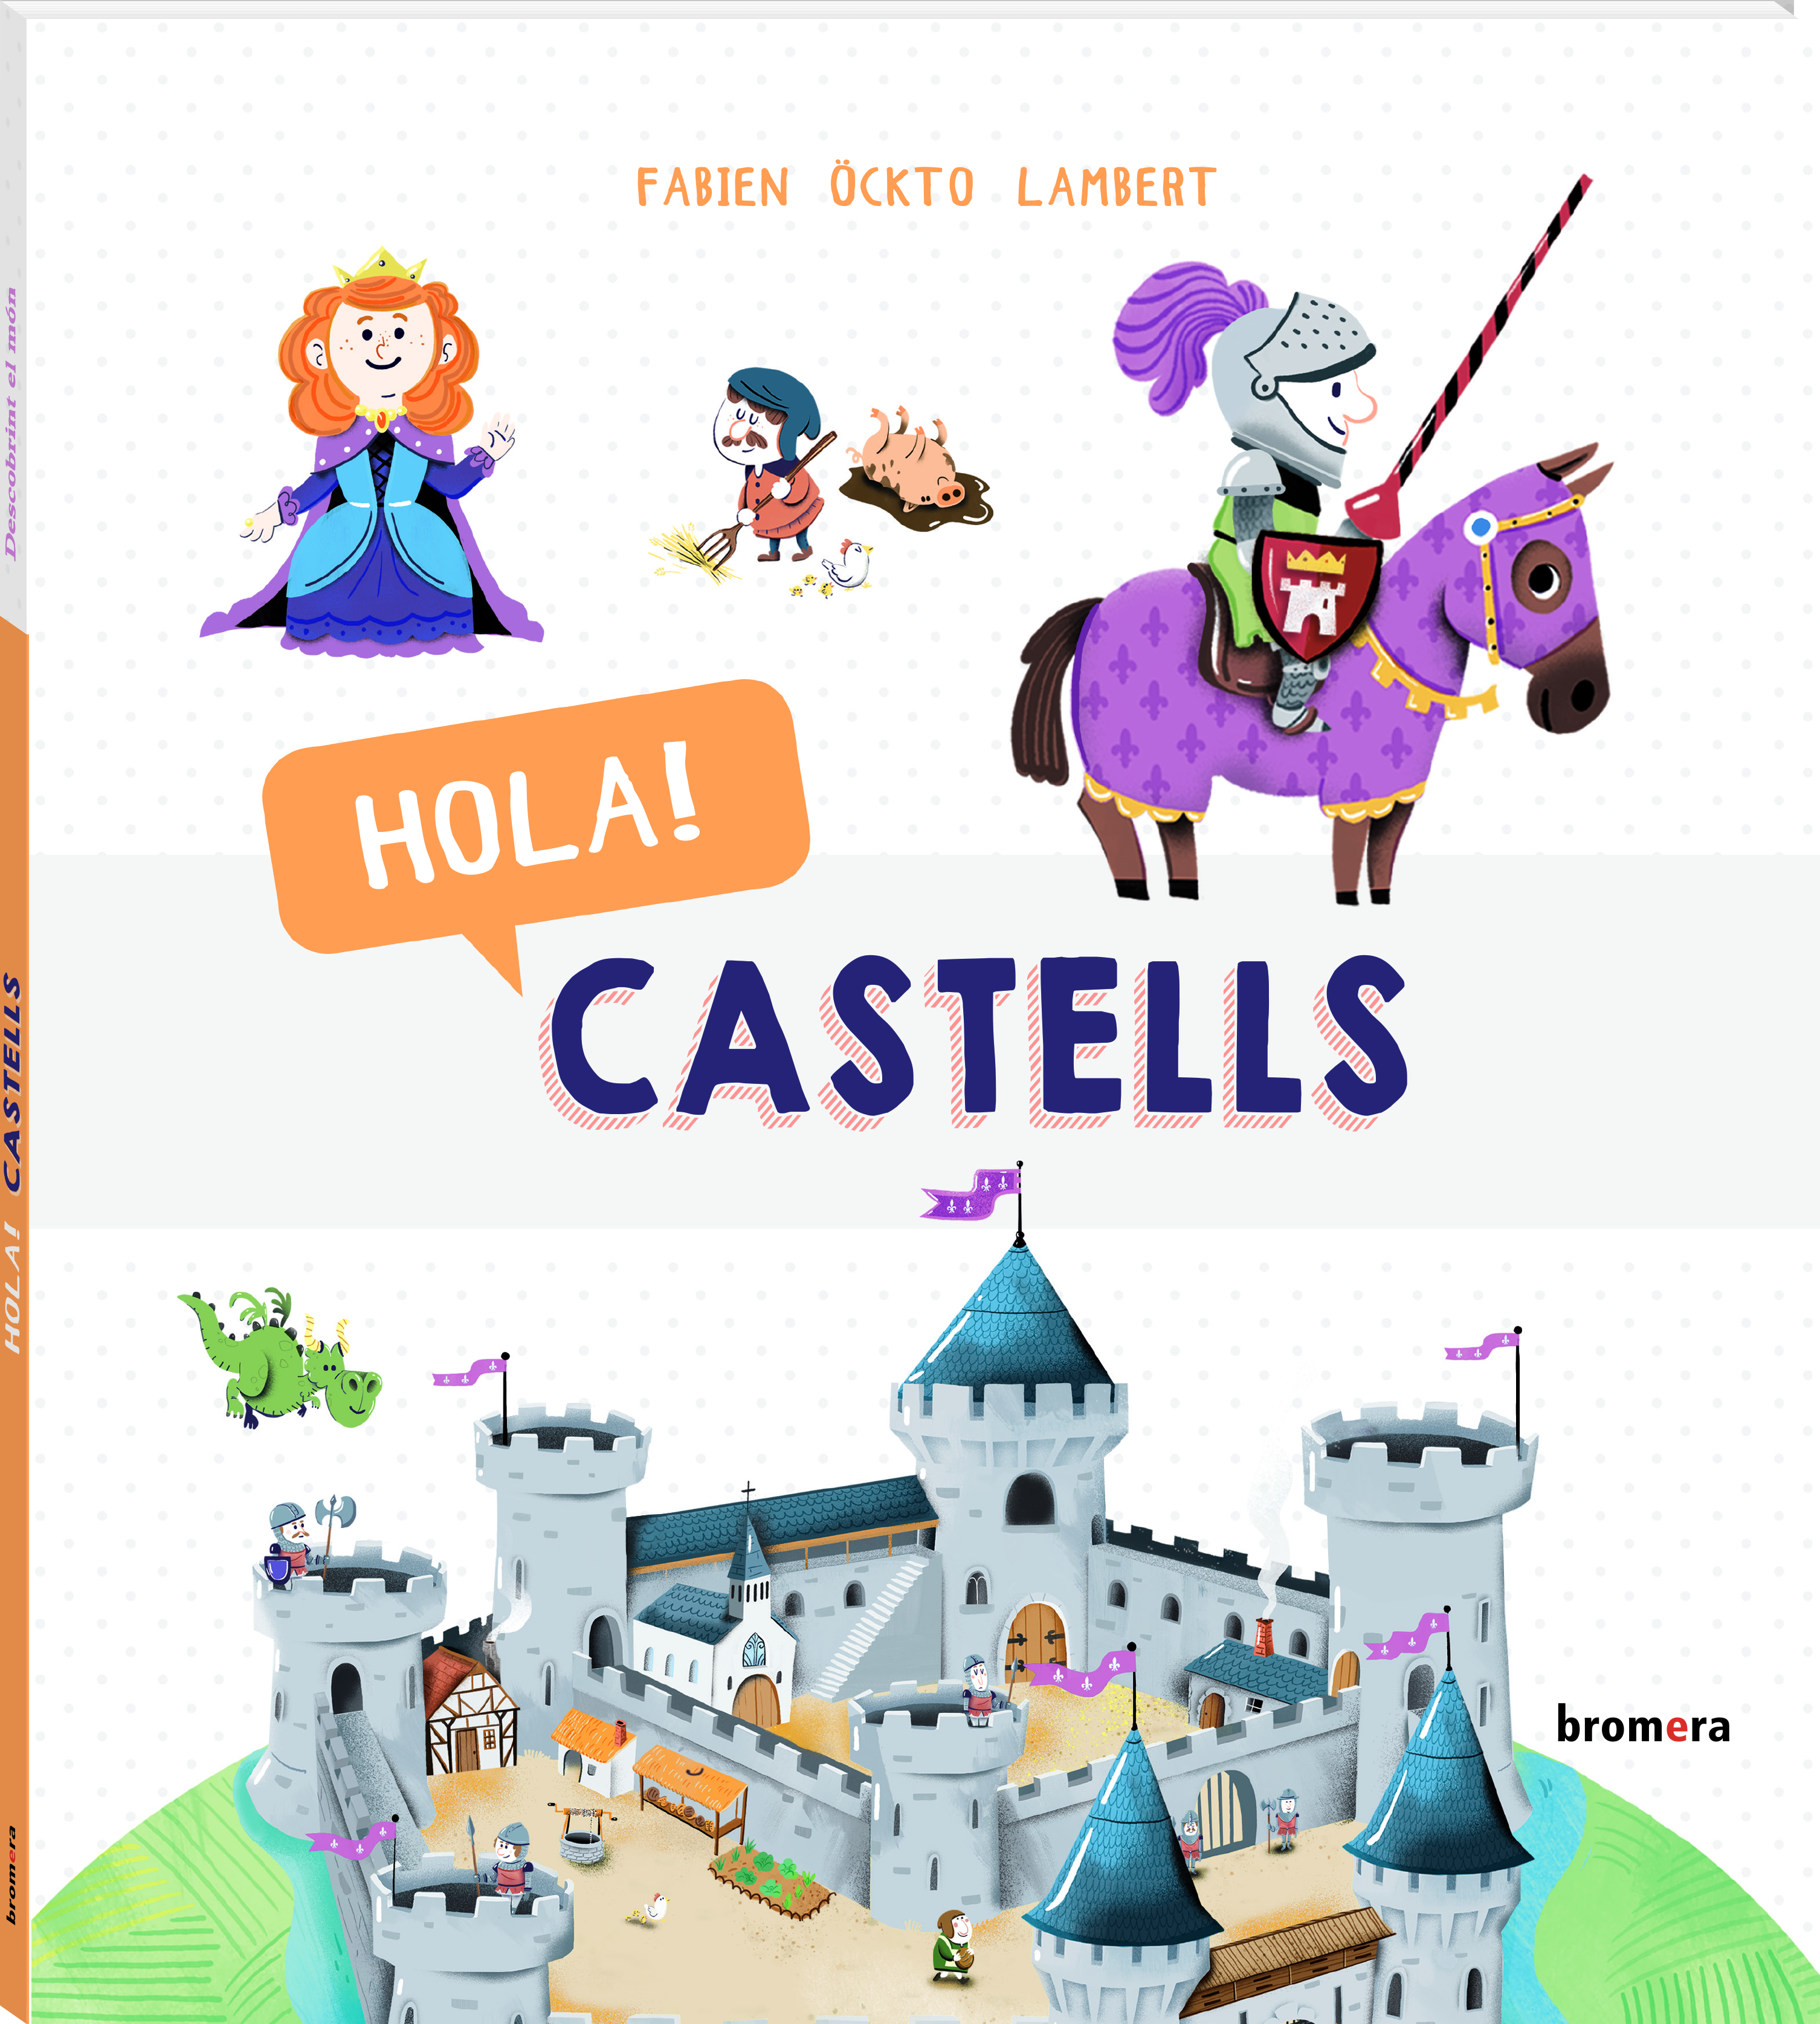 Hola-castells.png